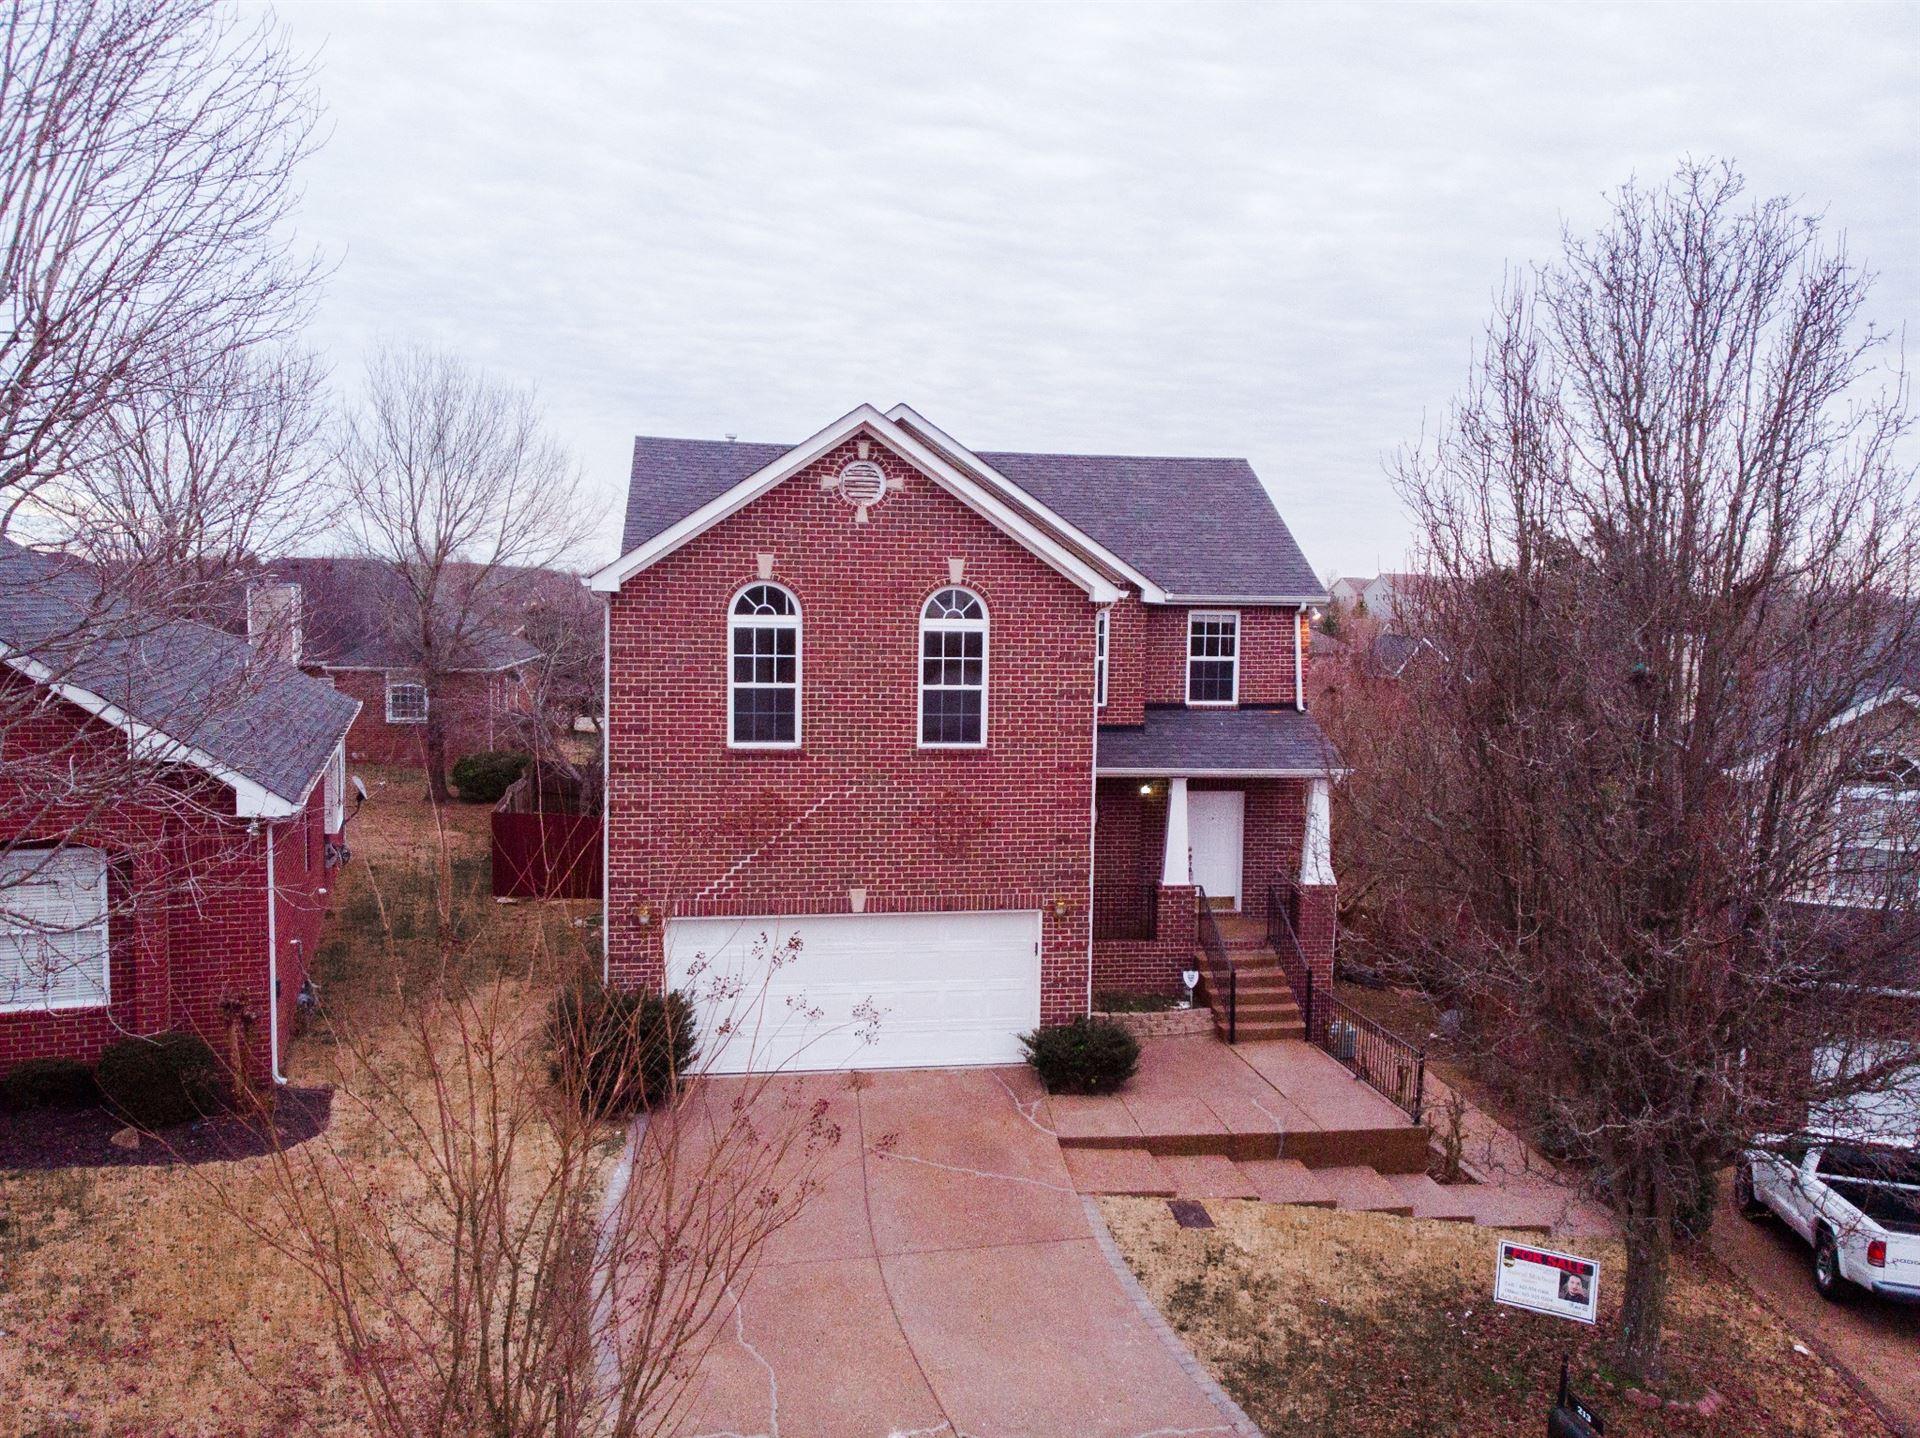 Photo of 213 Scarlet Ridge Ct, Brentwood, TN 37027 (MLS # 2220209)